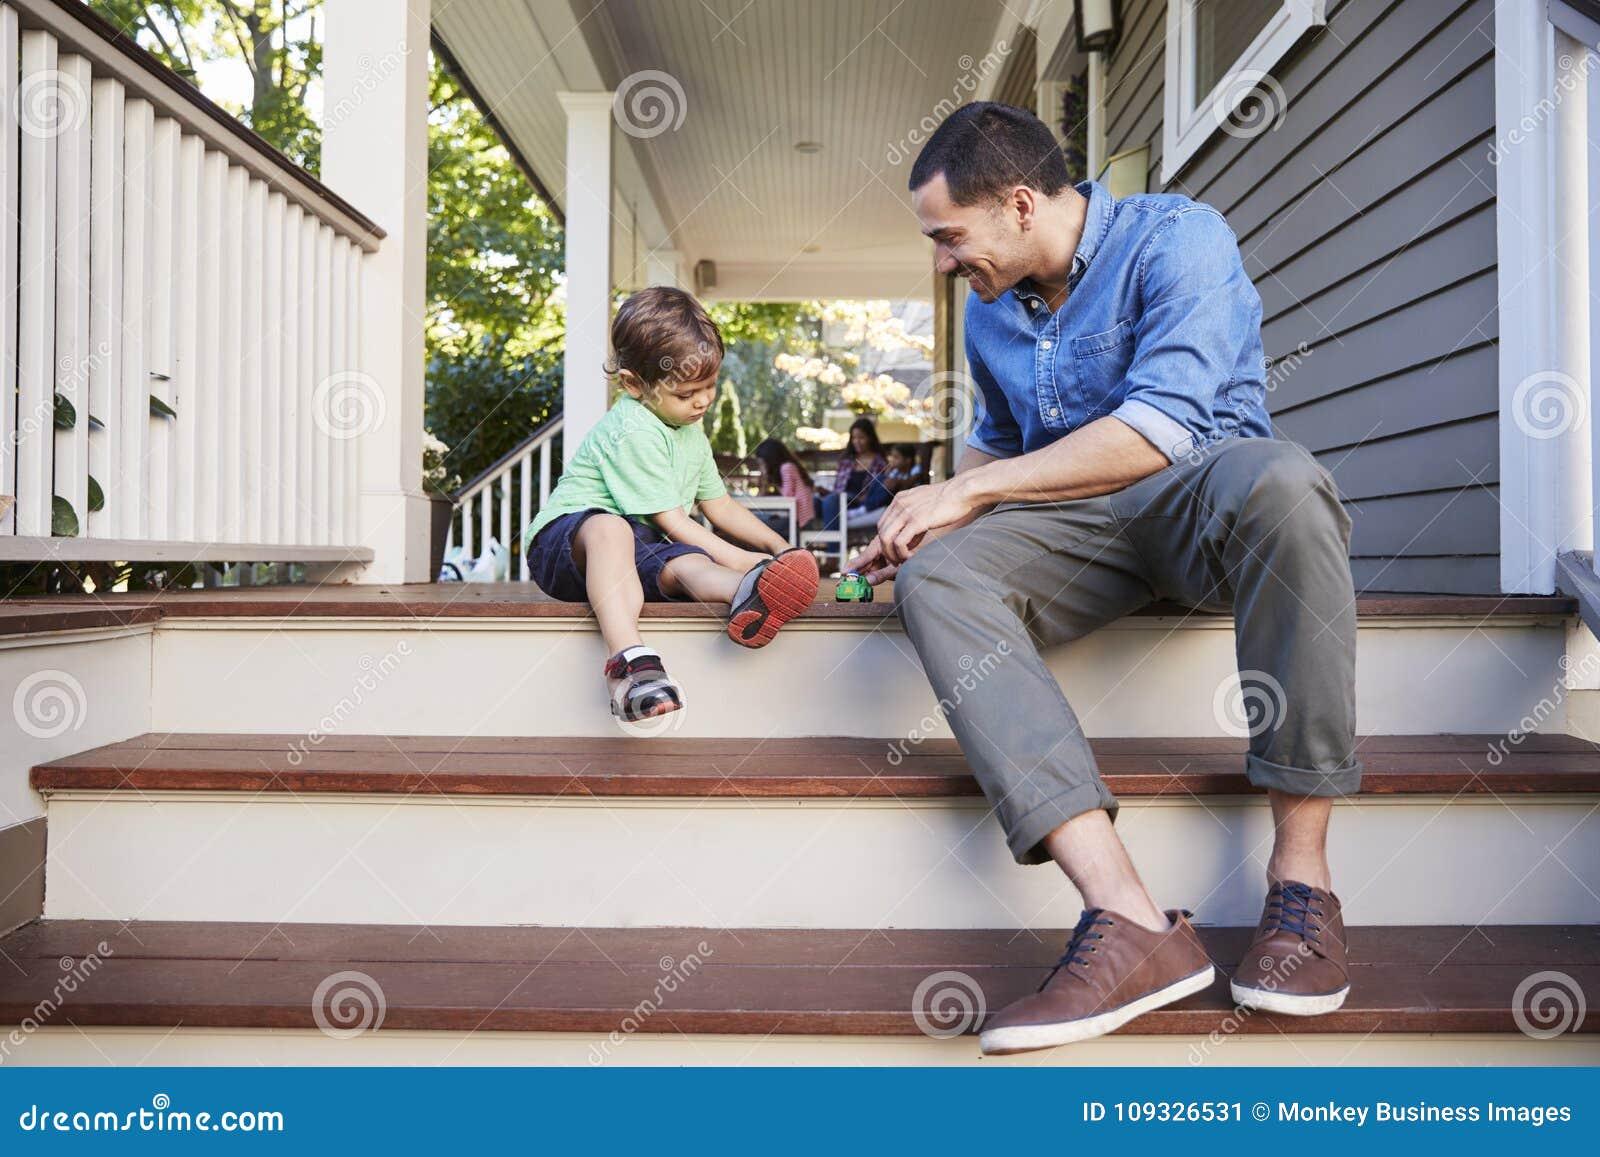 Padre And Son Sit On Porch Of House che gioca insieme con i giocattoli